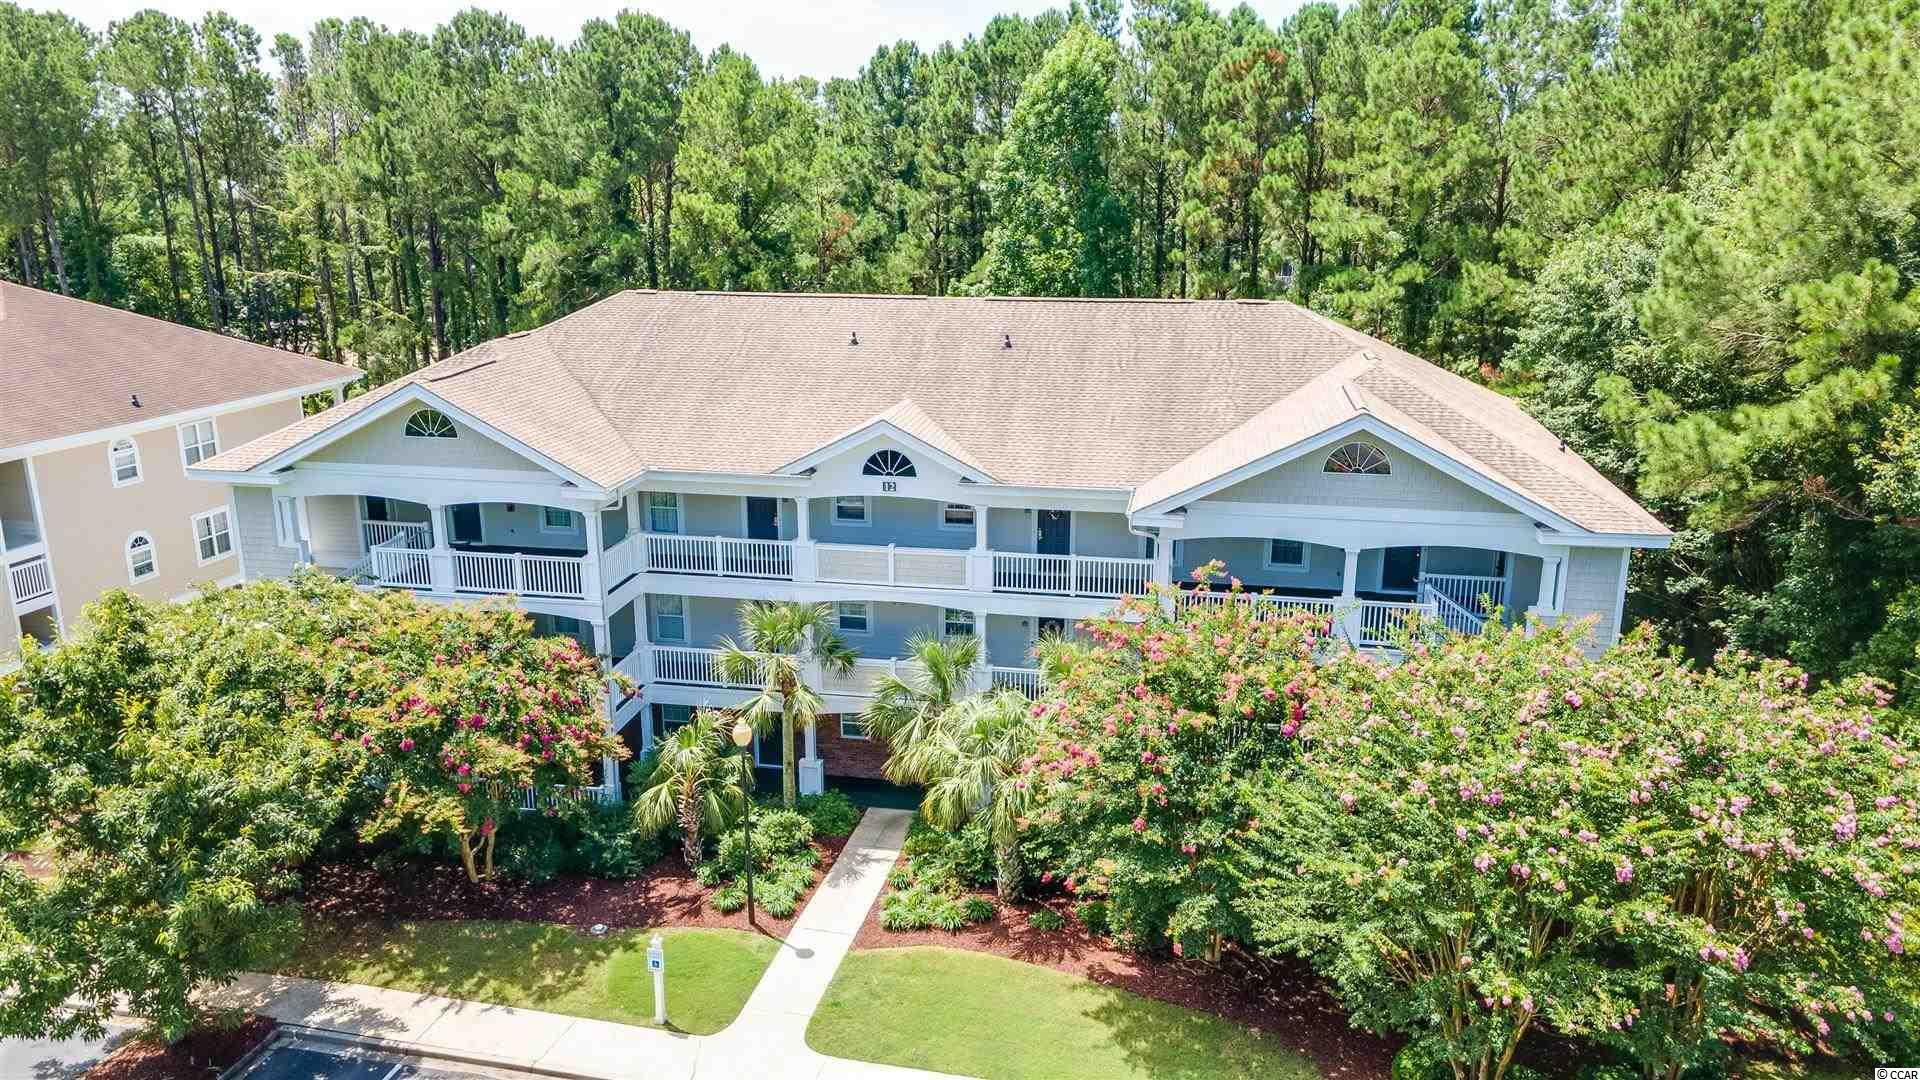 5825 Catalina Dr. #1212 Property Image